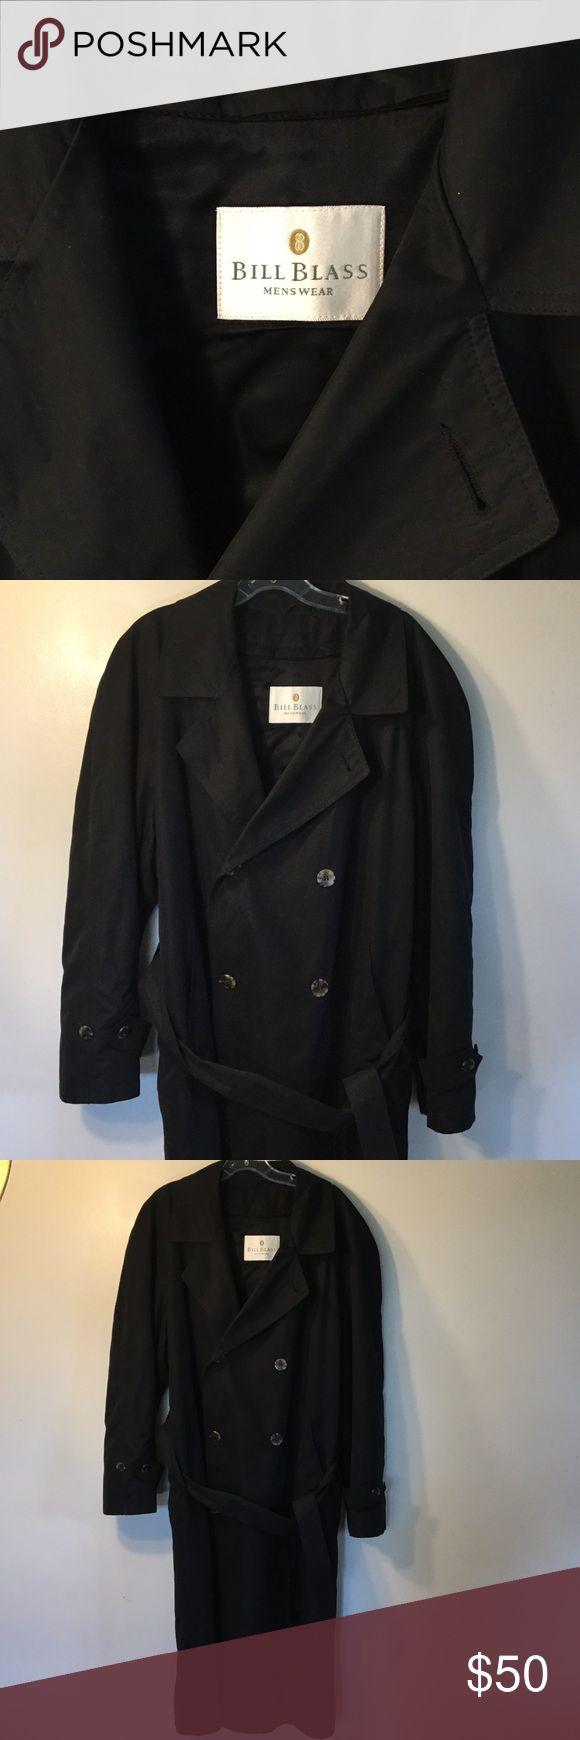 Men's raincoat ☔️ Long black double breasted raincoat.  100% wool. Open to offers Bill Blass Jackets & Coats Raincoats